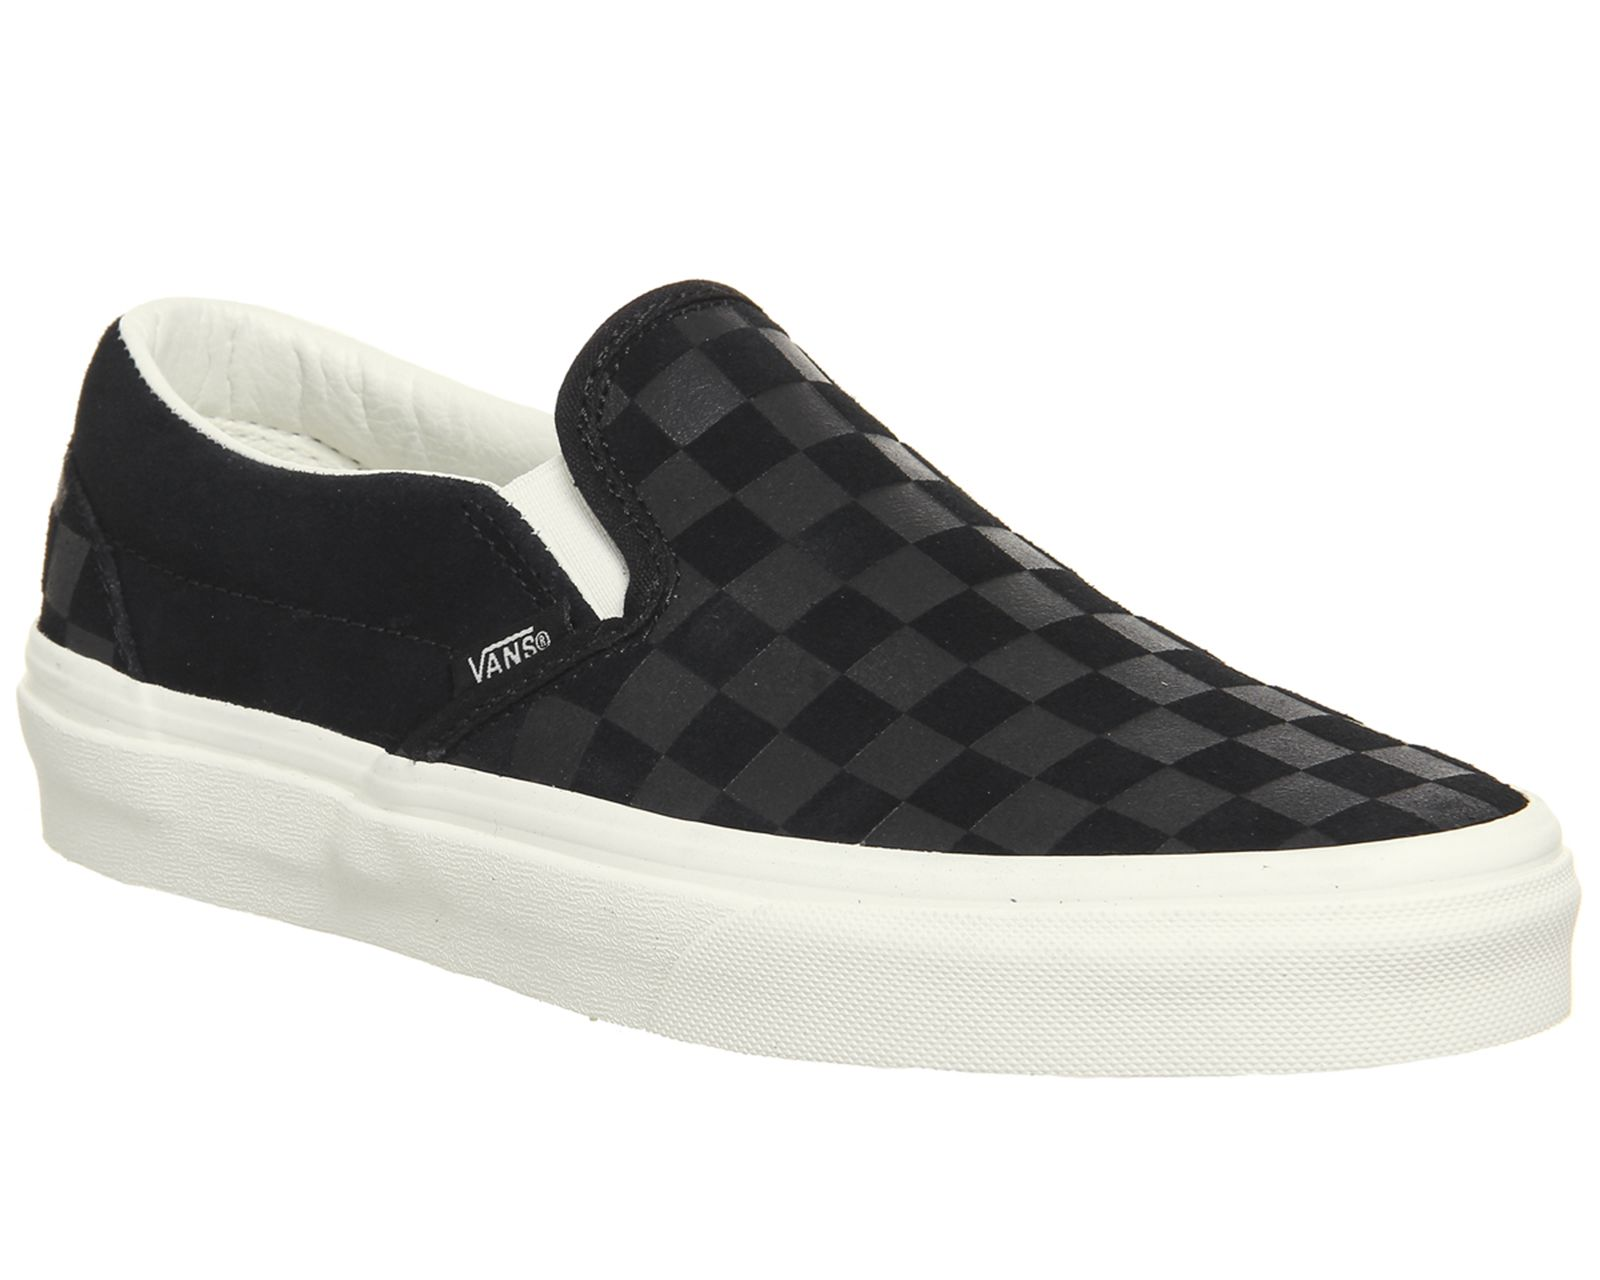 Vans Classic Slip On Trainers | Vans slip on black, Vans ...